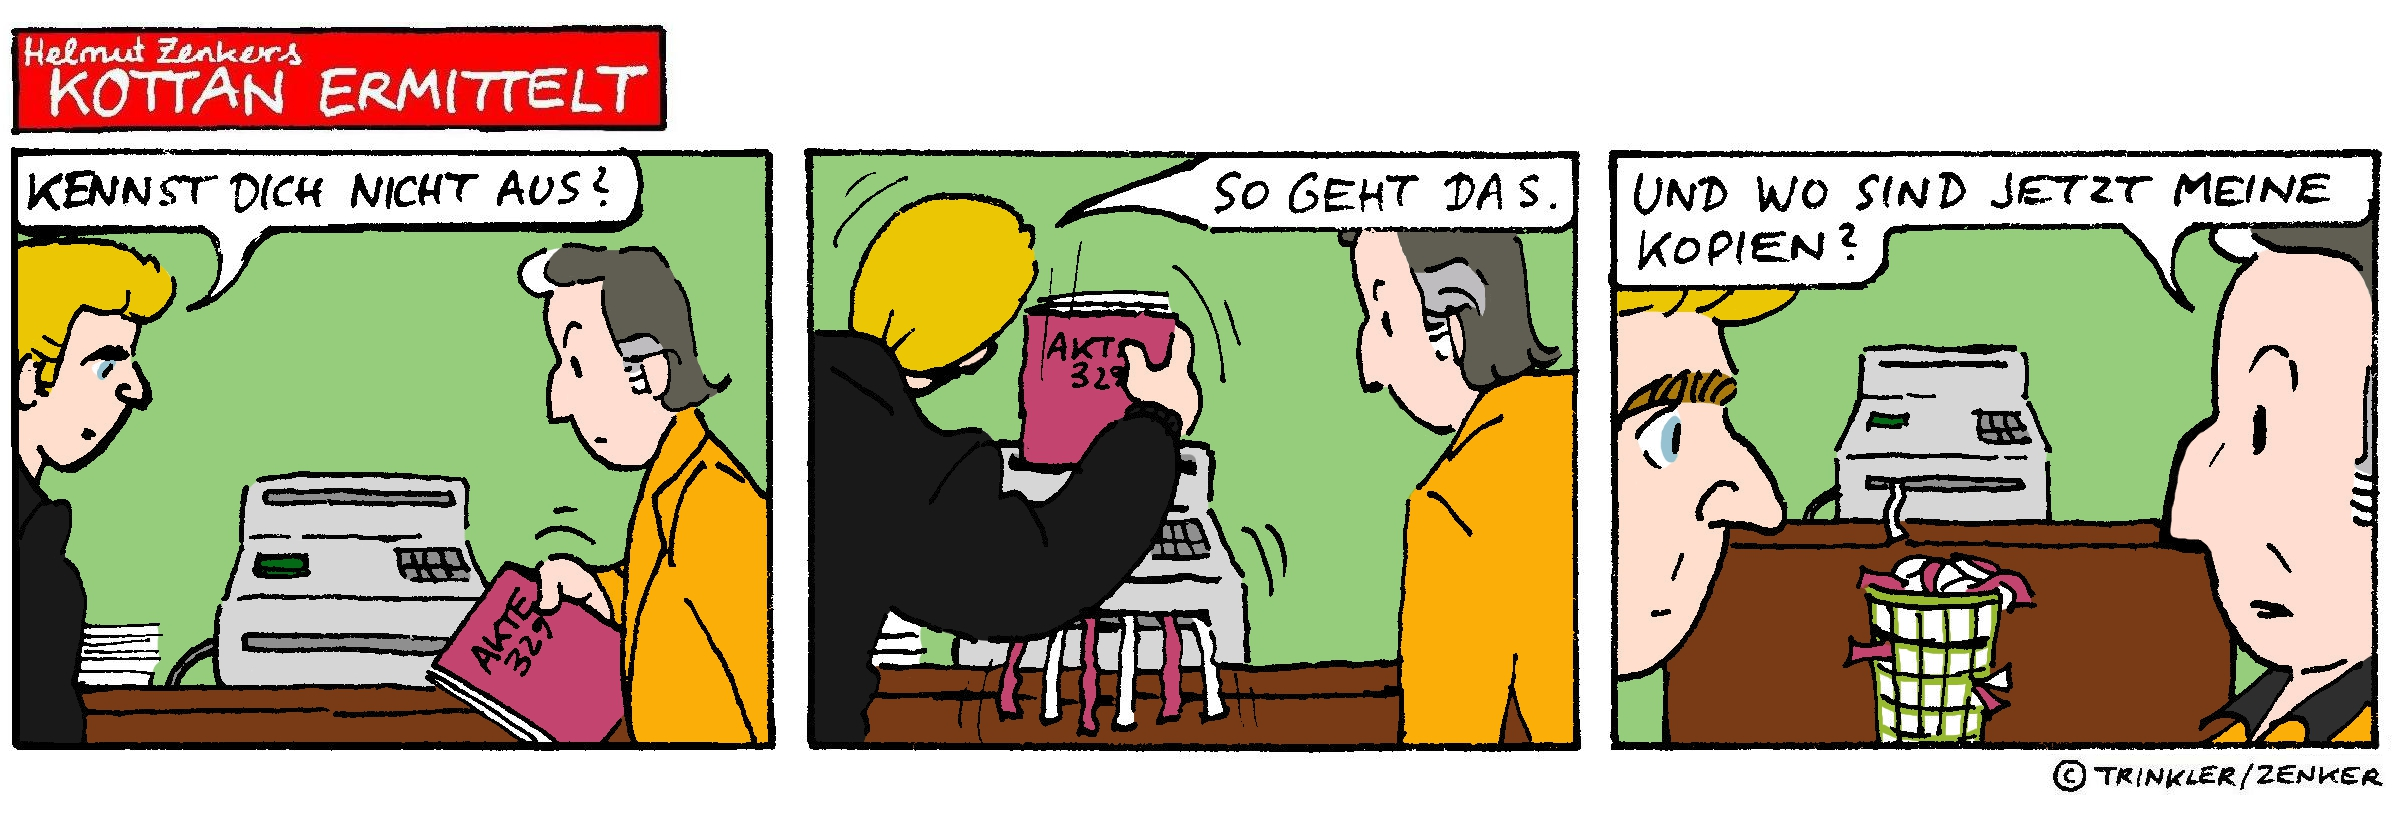 Kottan ermittelt - Comicstrip Nr. 9